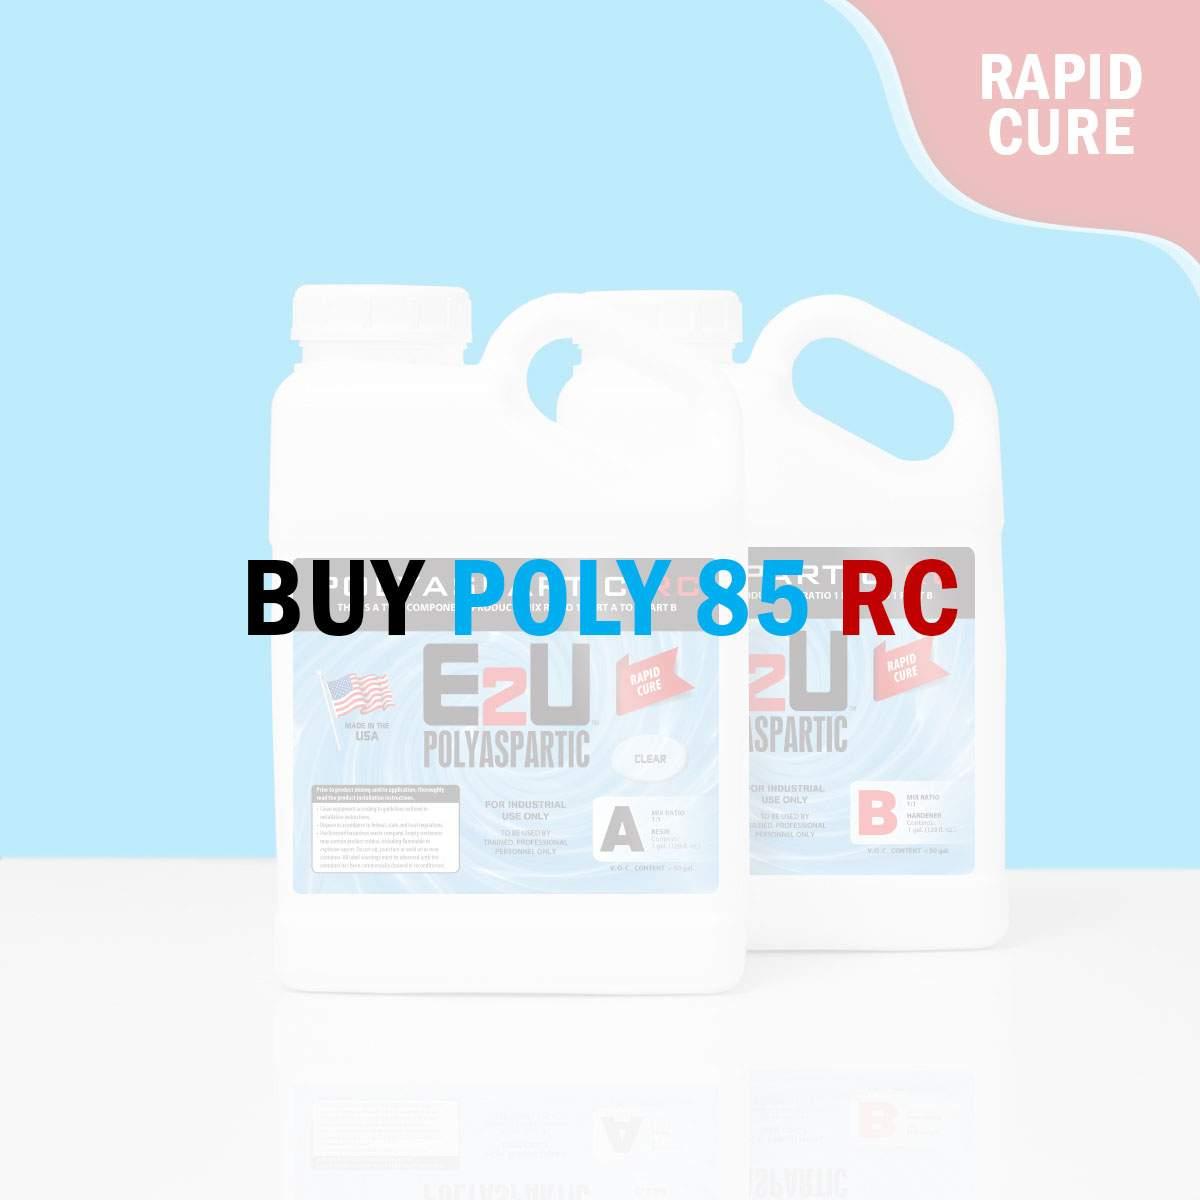 Buy-Poly-85-RC